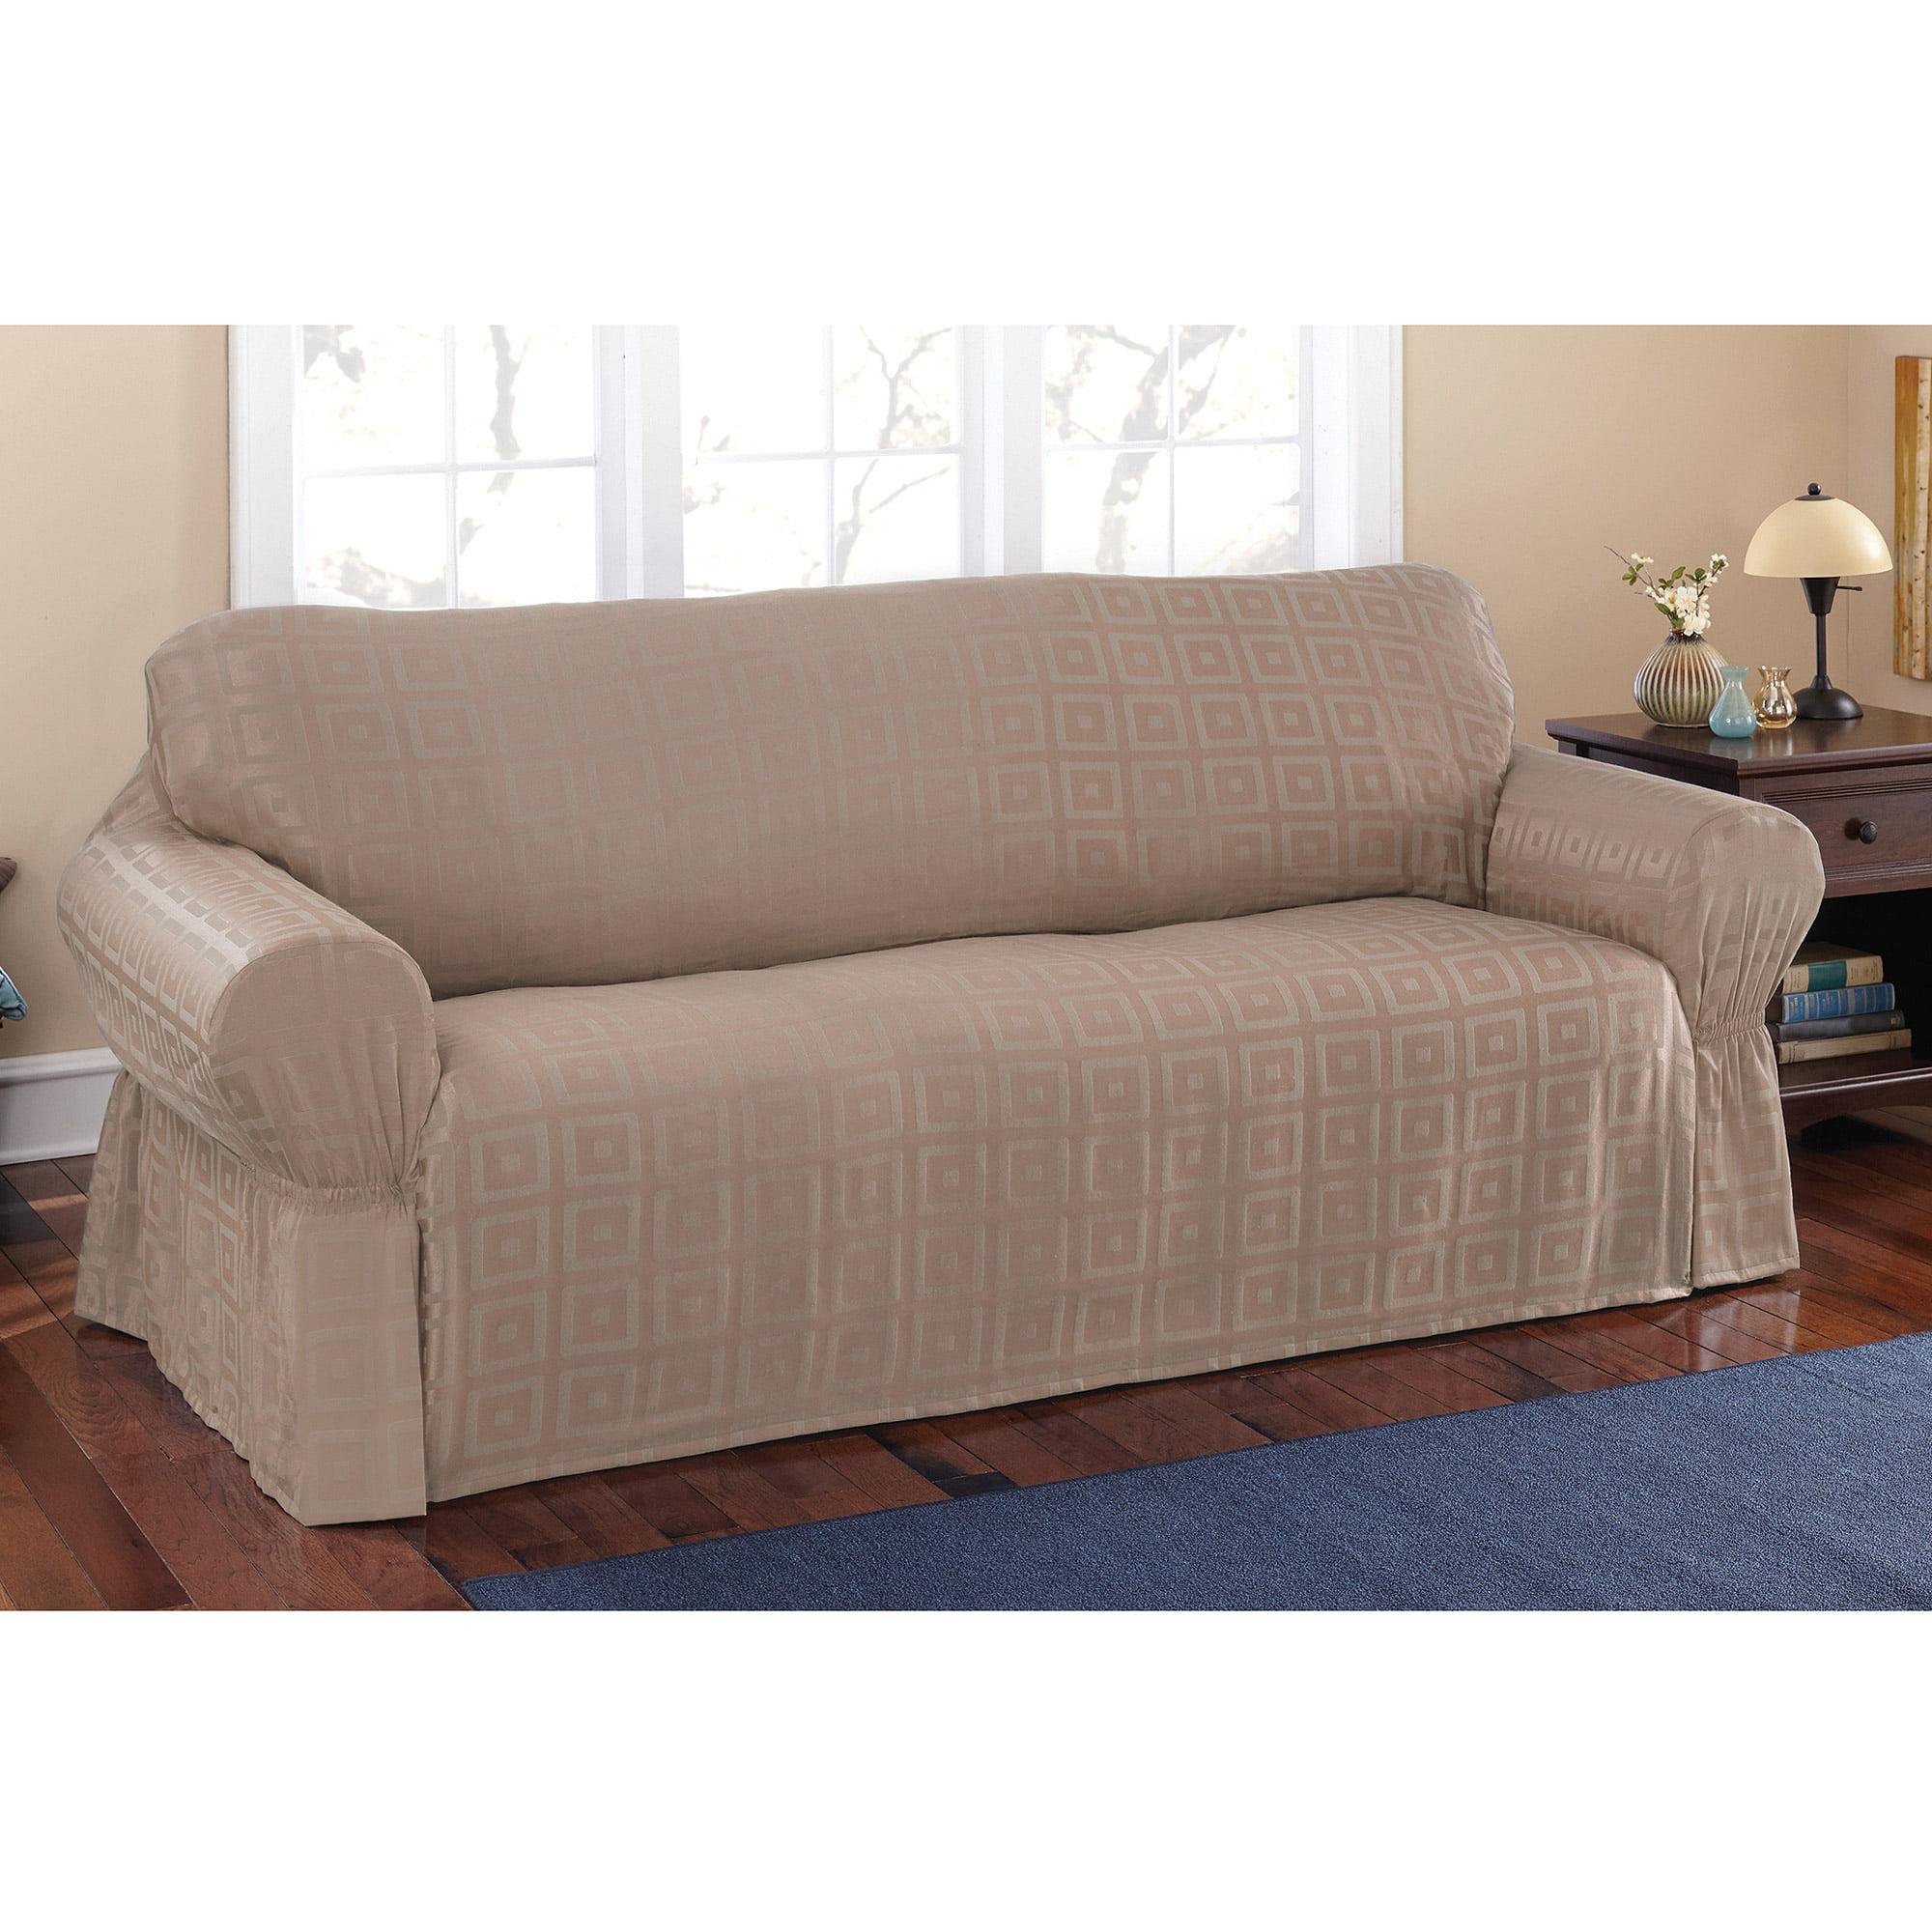 Mainstays Sherwood Slipcover Sofa